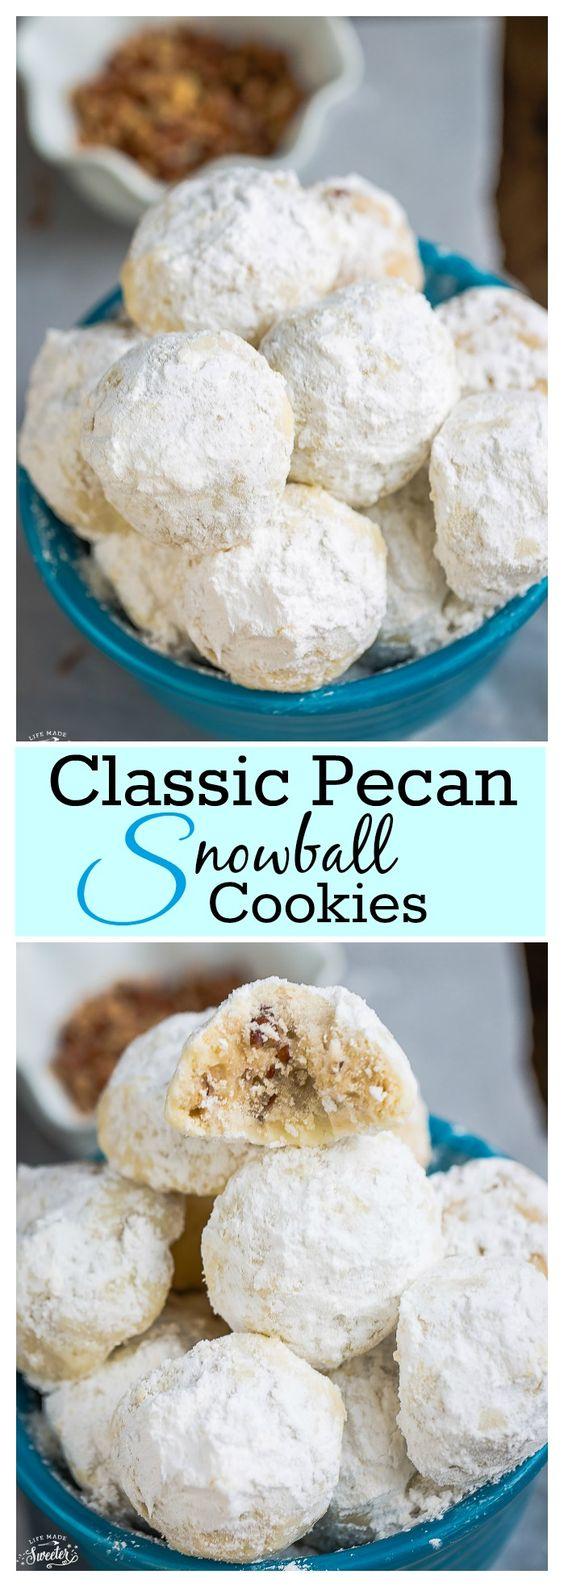 Classic Pecan Snowball Cookies